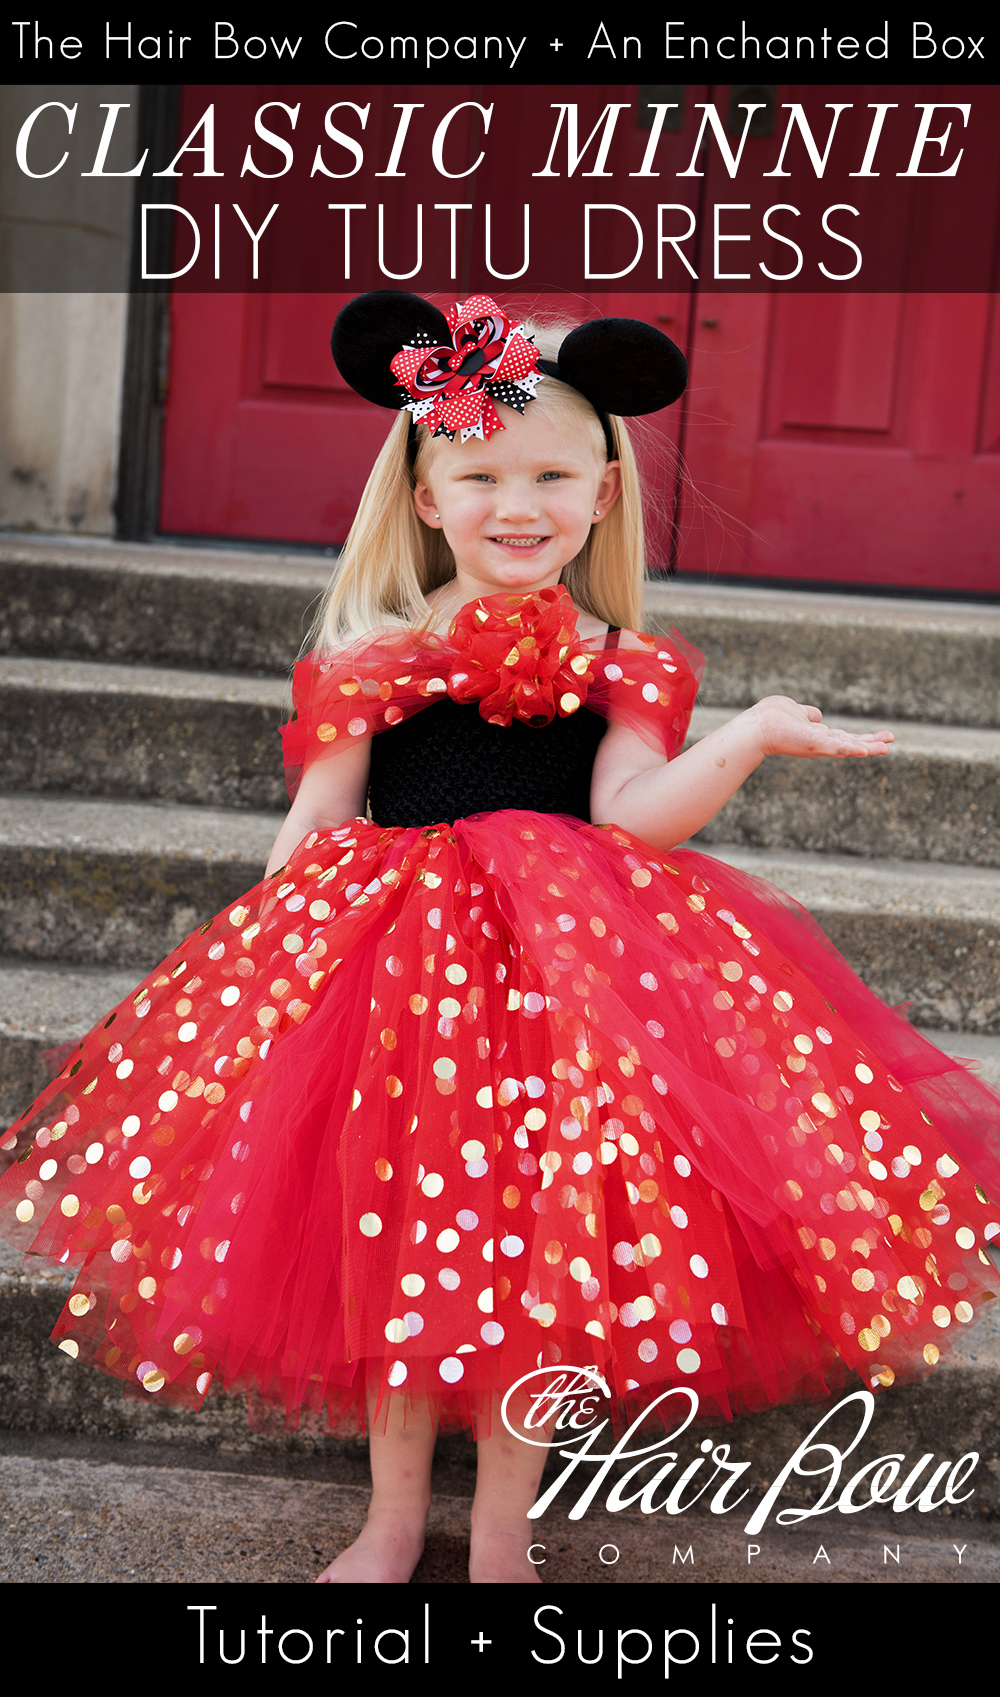 Classic minnie mouse tutu dress diy tutorial the hair bow company solutioingenieria Images